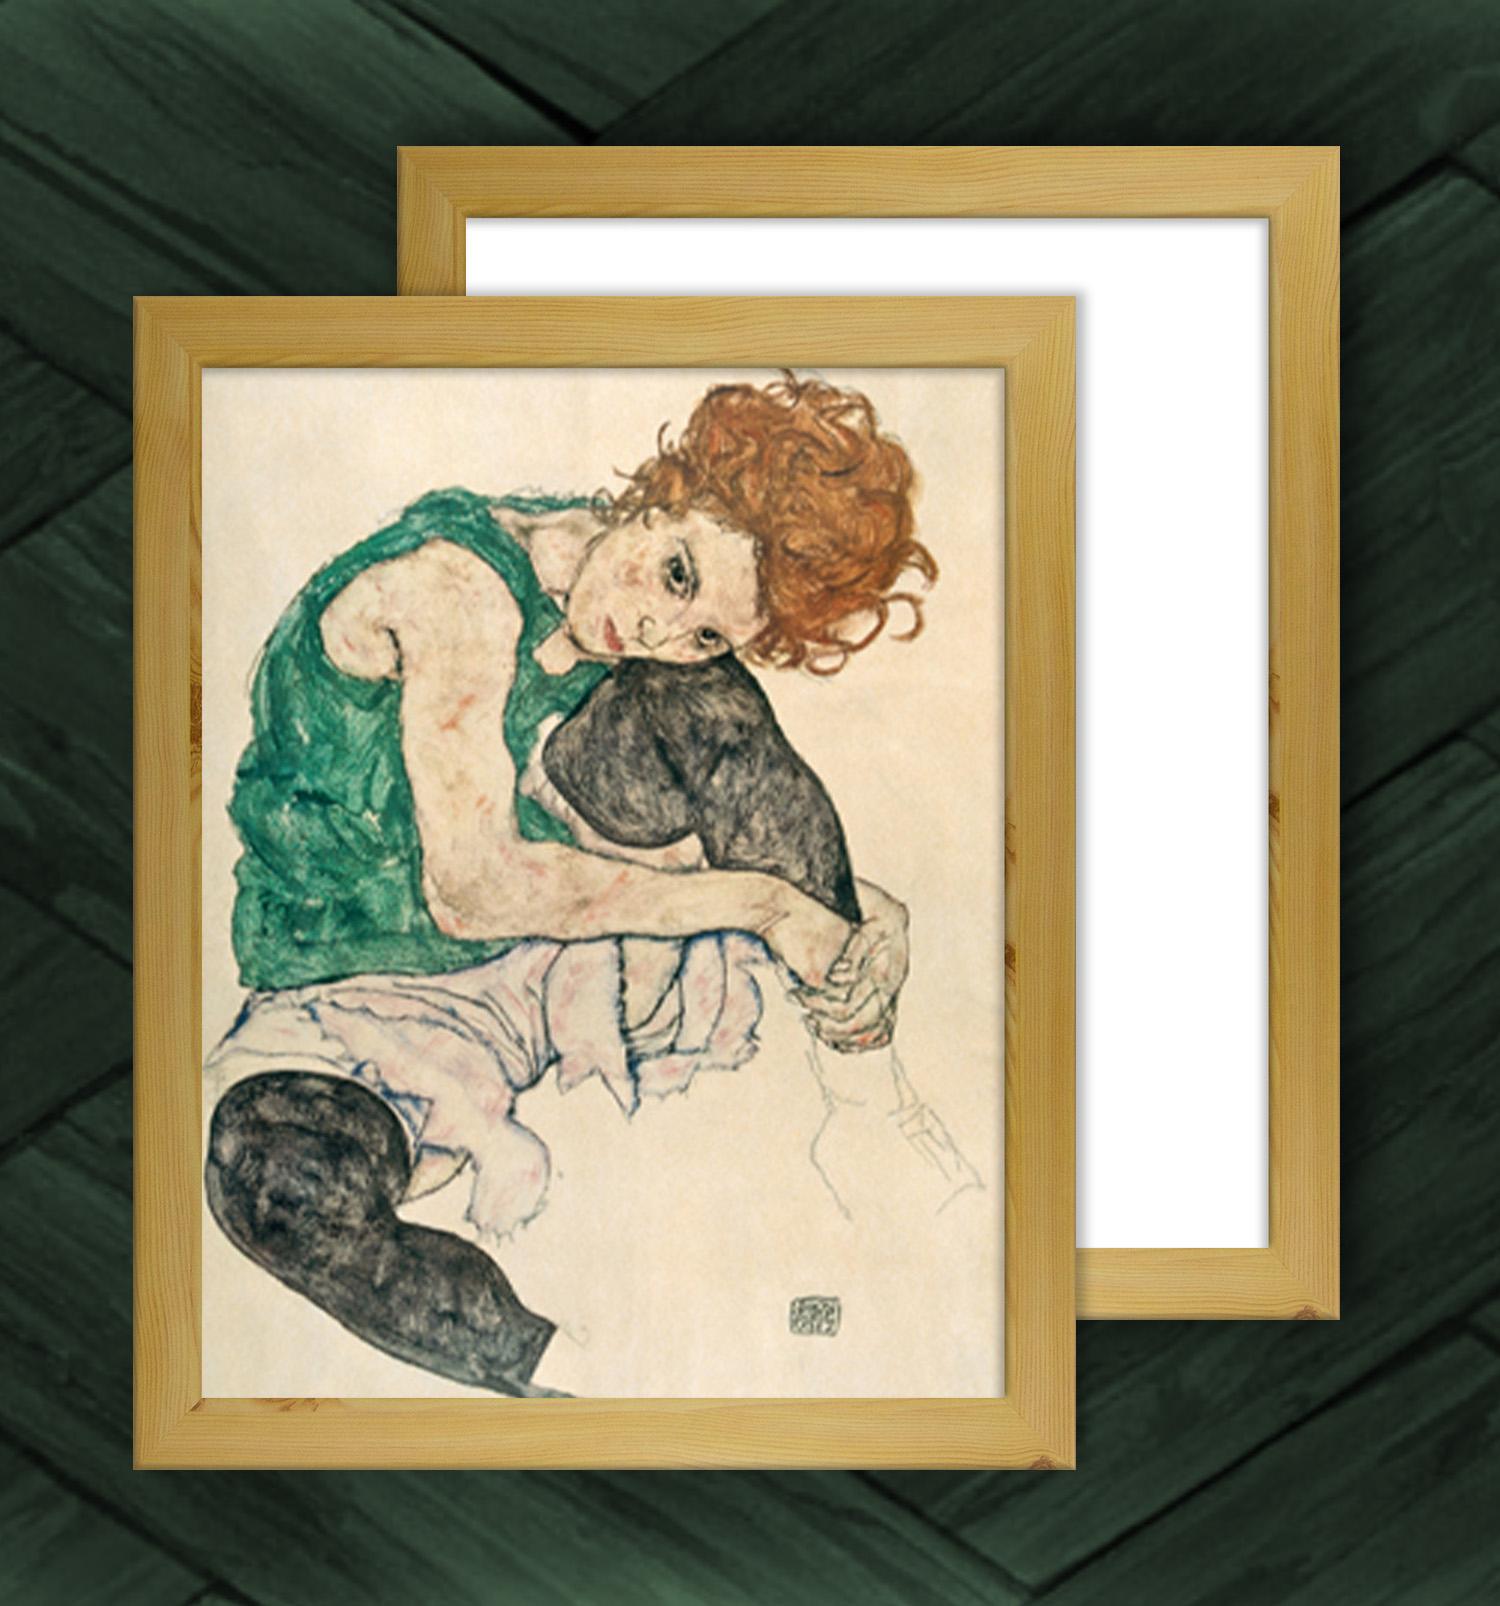 Bilderrahmen Misano 55x55 cm Rückwandfarbe und Verglasung wählbar